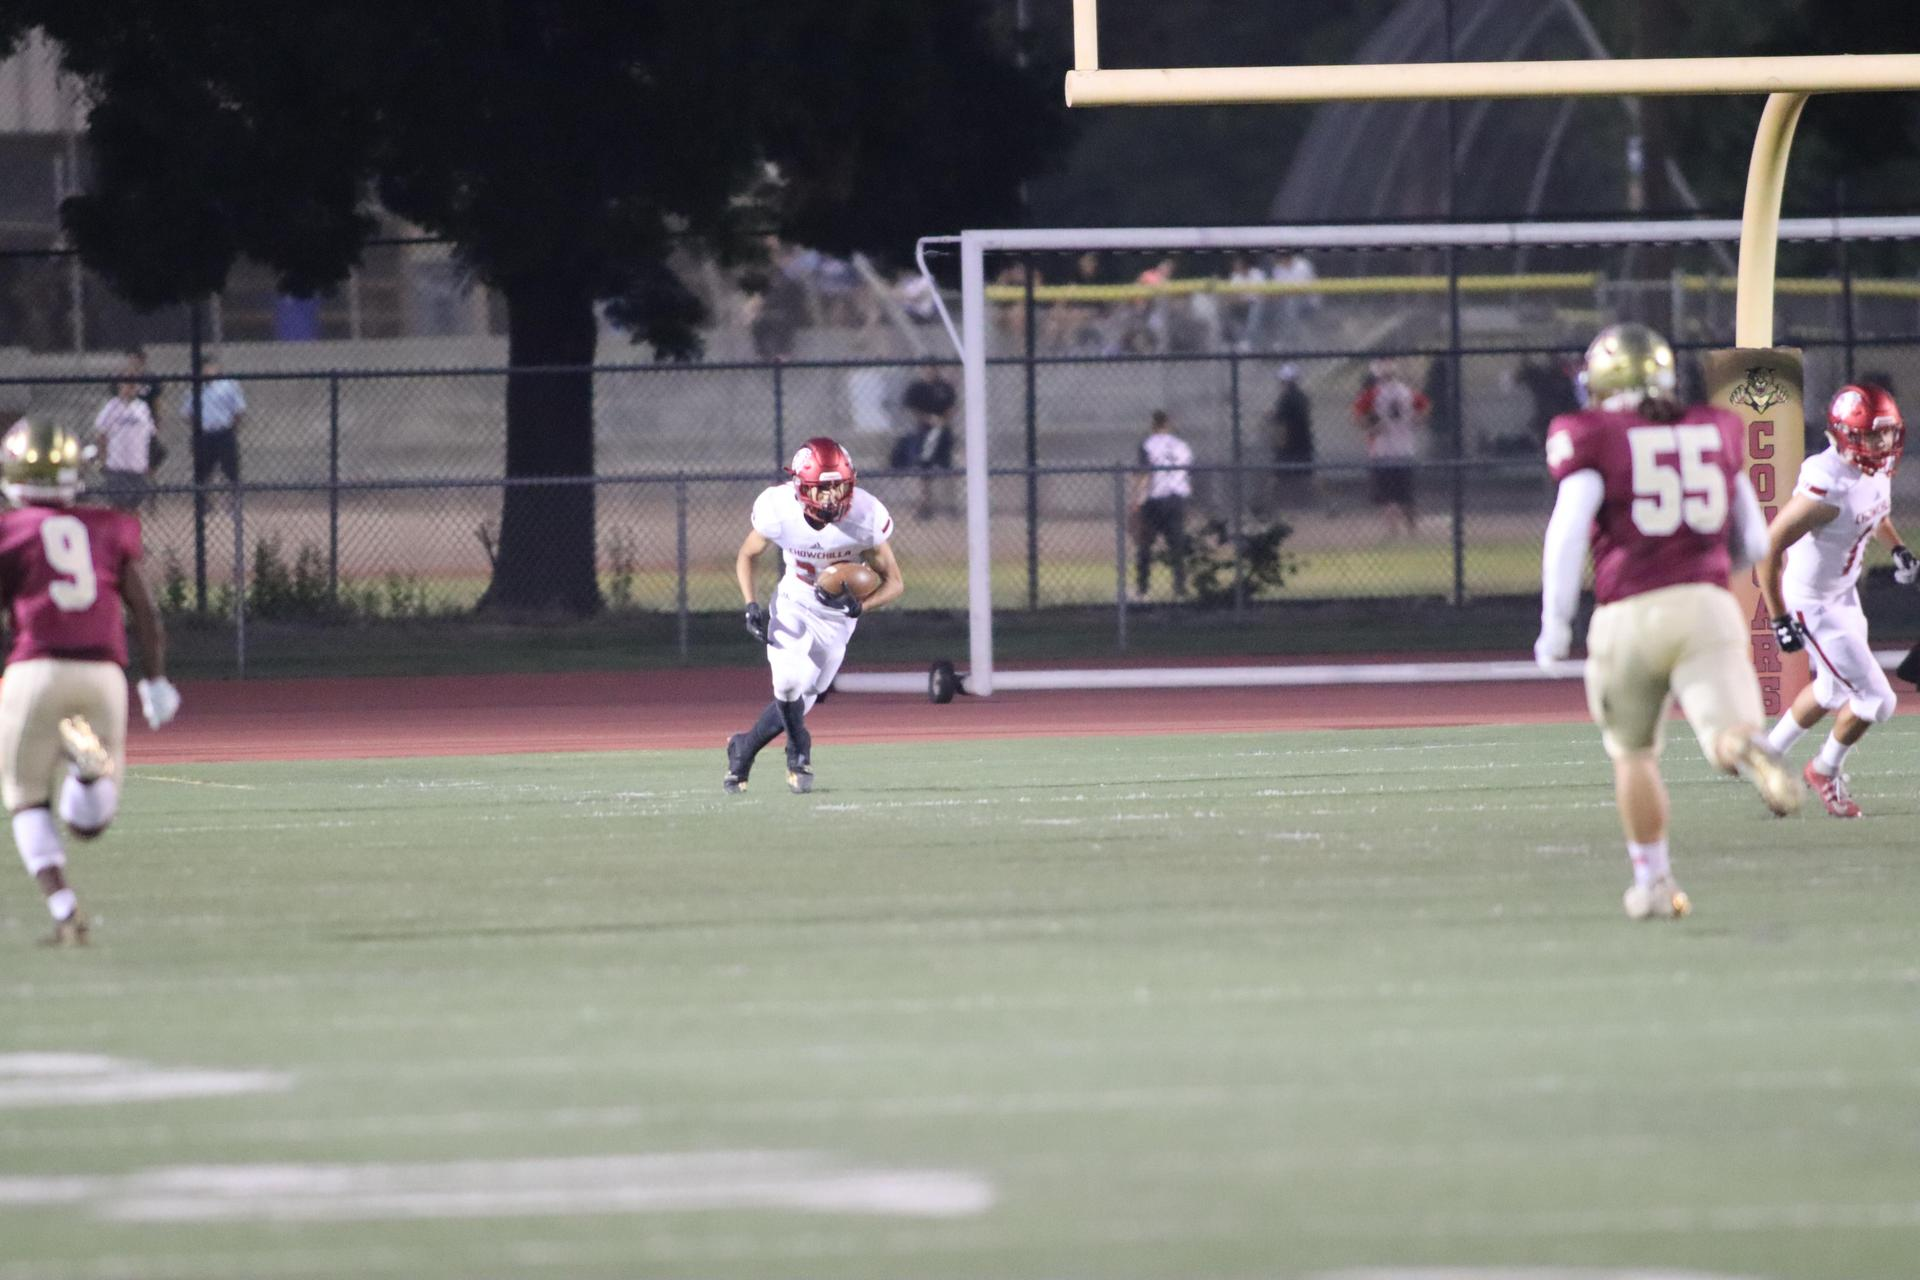 Varsity boys playing football against Golden Valley